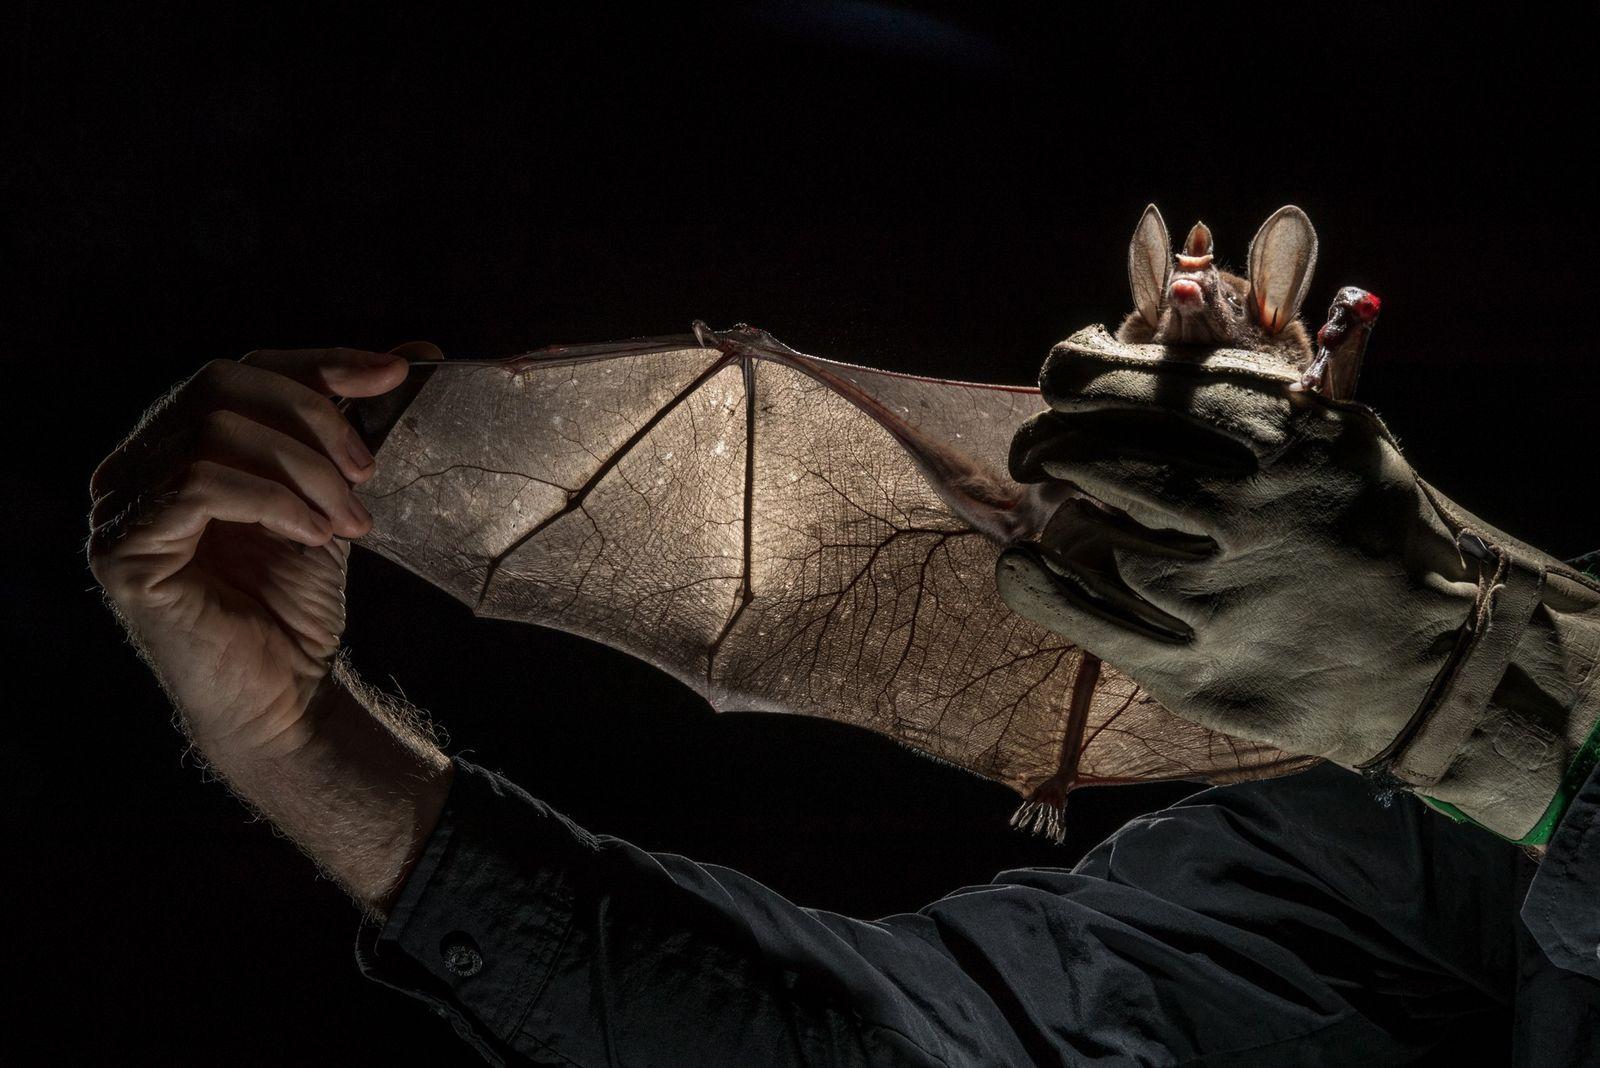 Luego de cazar con una red a este murciélago espectral, Vleut lo toma suavemente para estudiarlo. ...